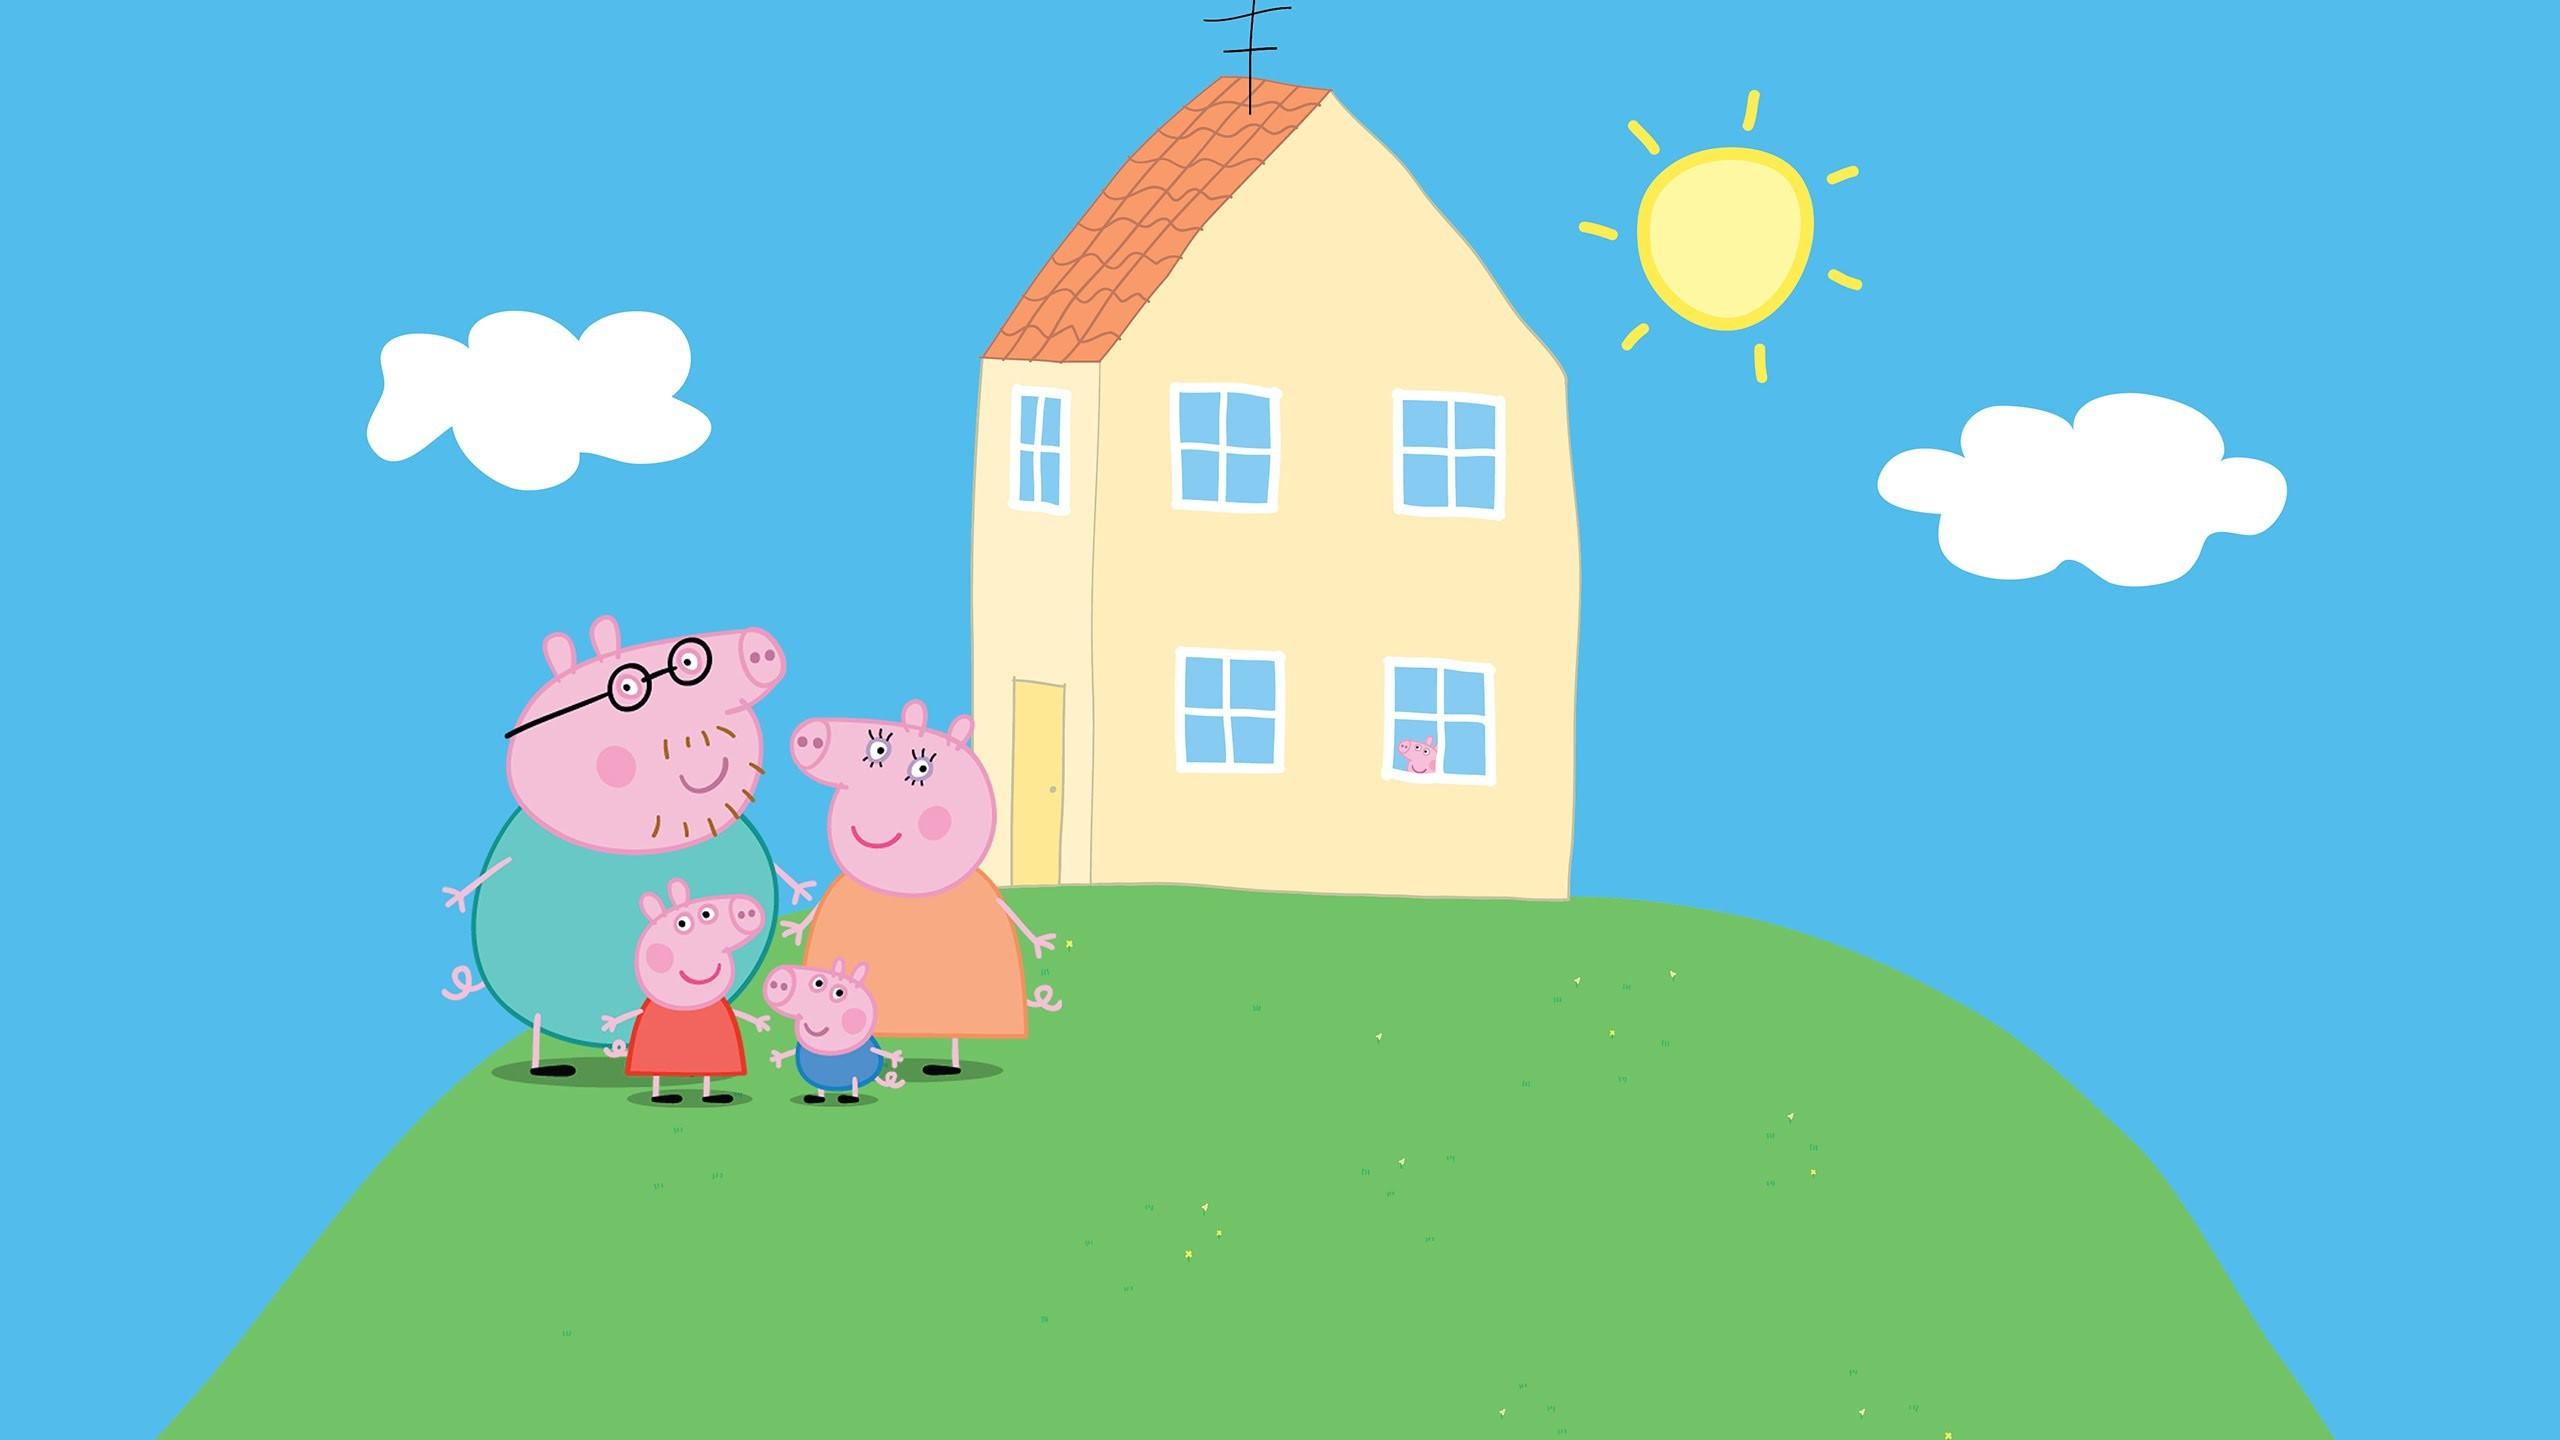 peppa pig wallpaper 69 images